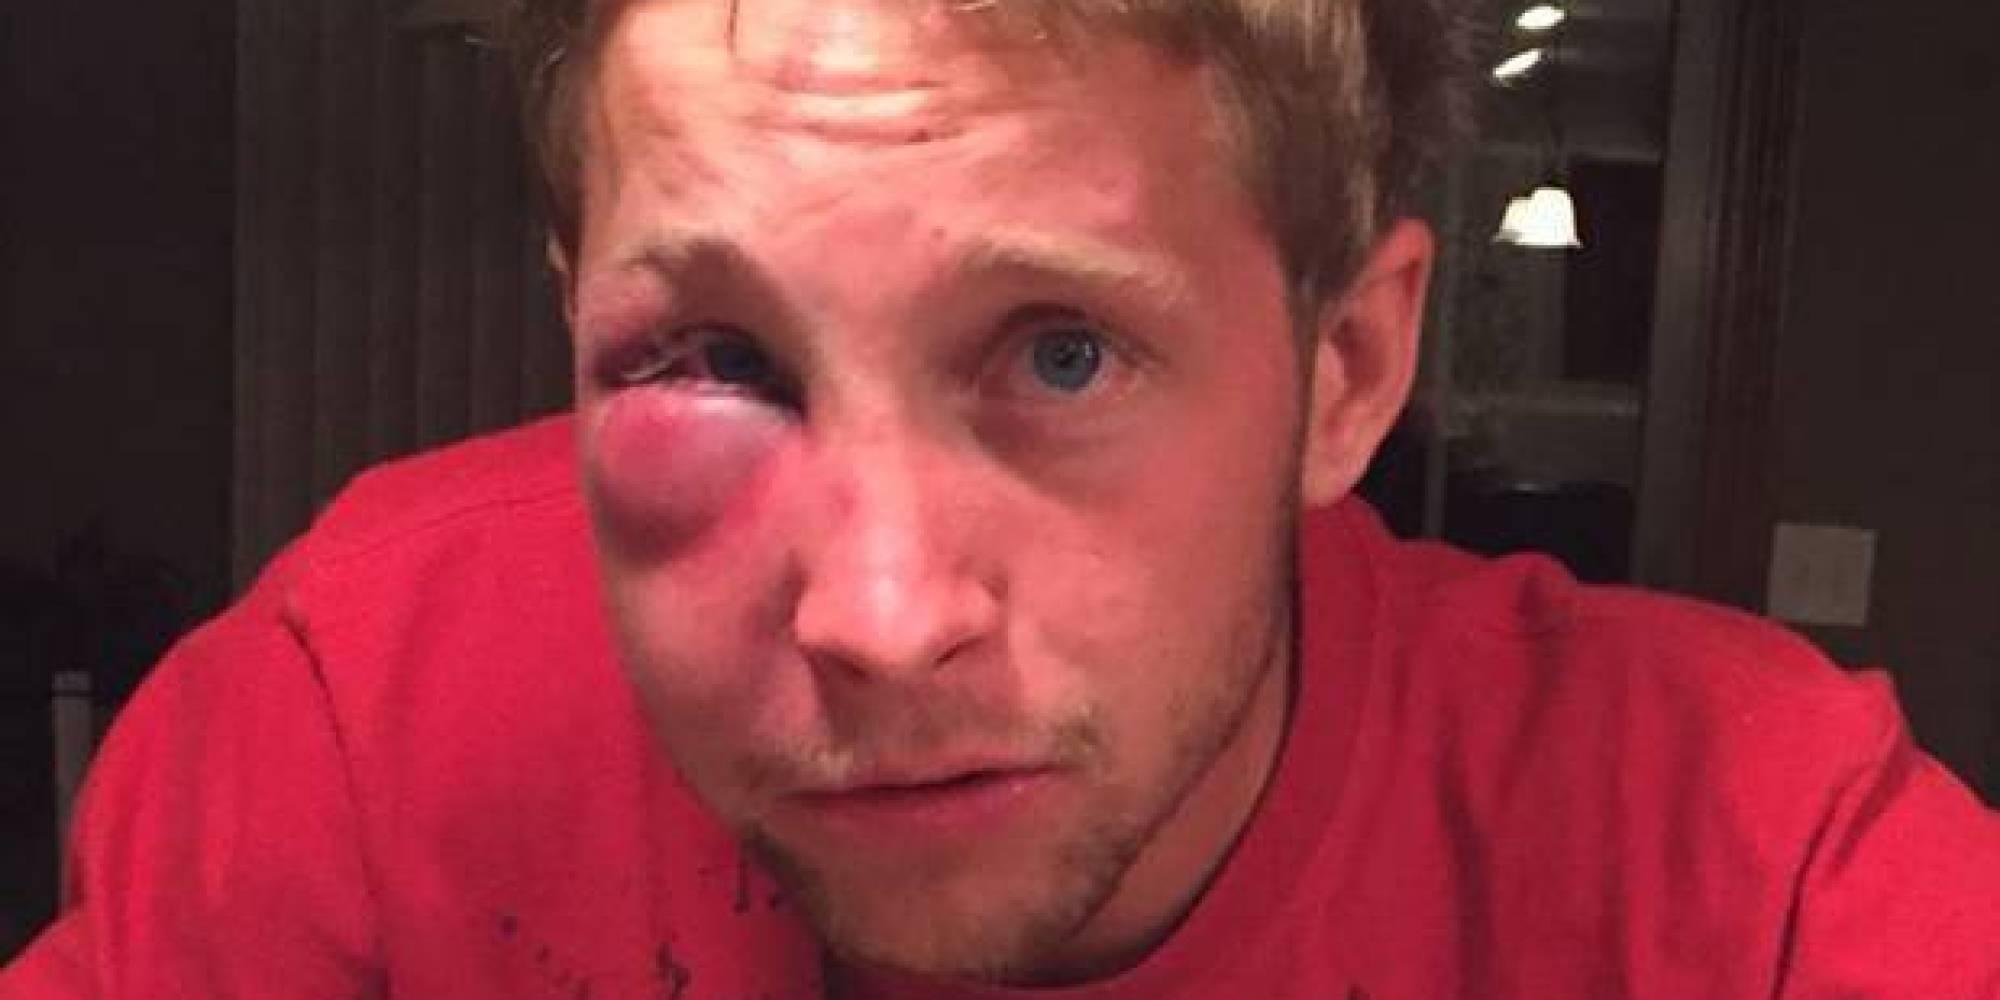 Jovem autista sofre bullying e pune seus agressores de forma inusitada